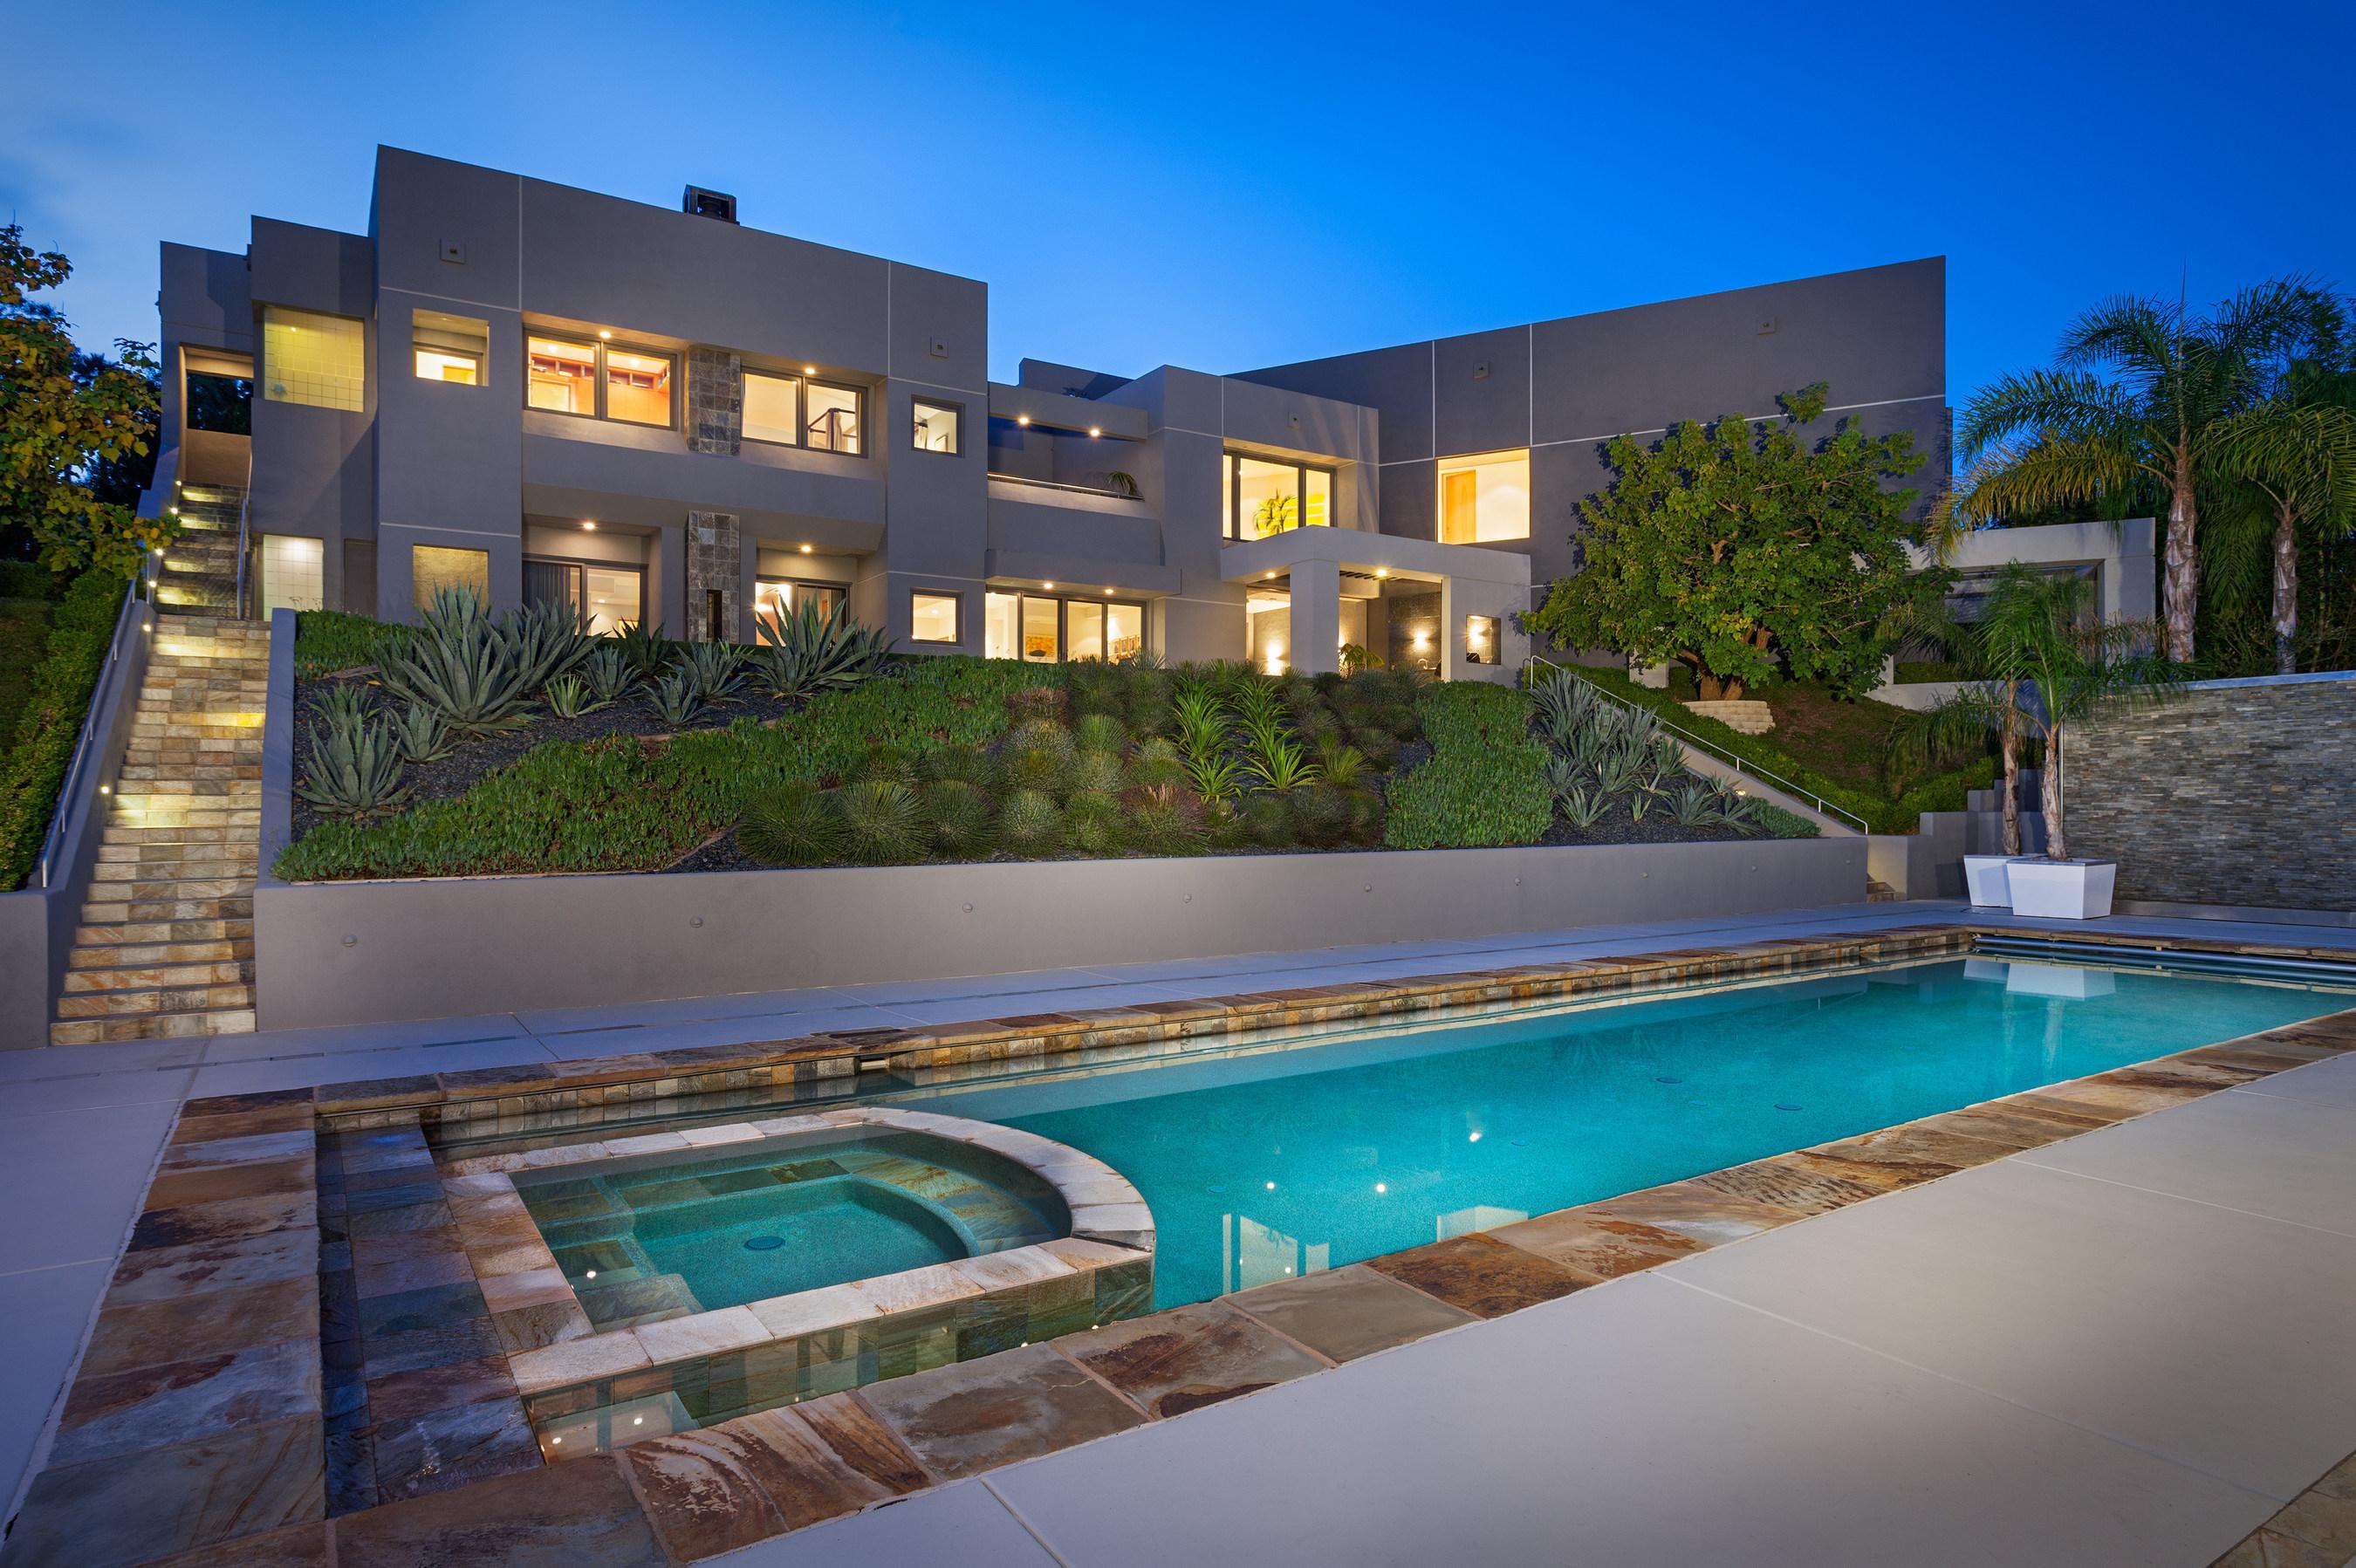 The Rancho Santa Fe home was originally listed at $9 million.